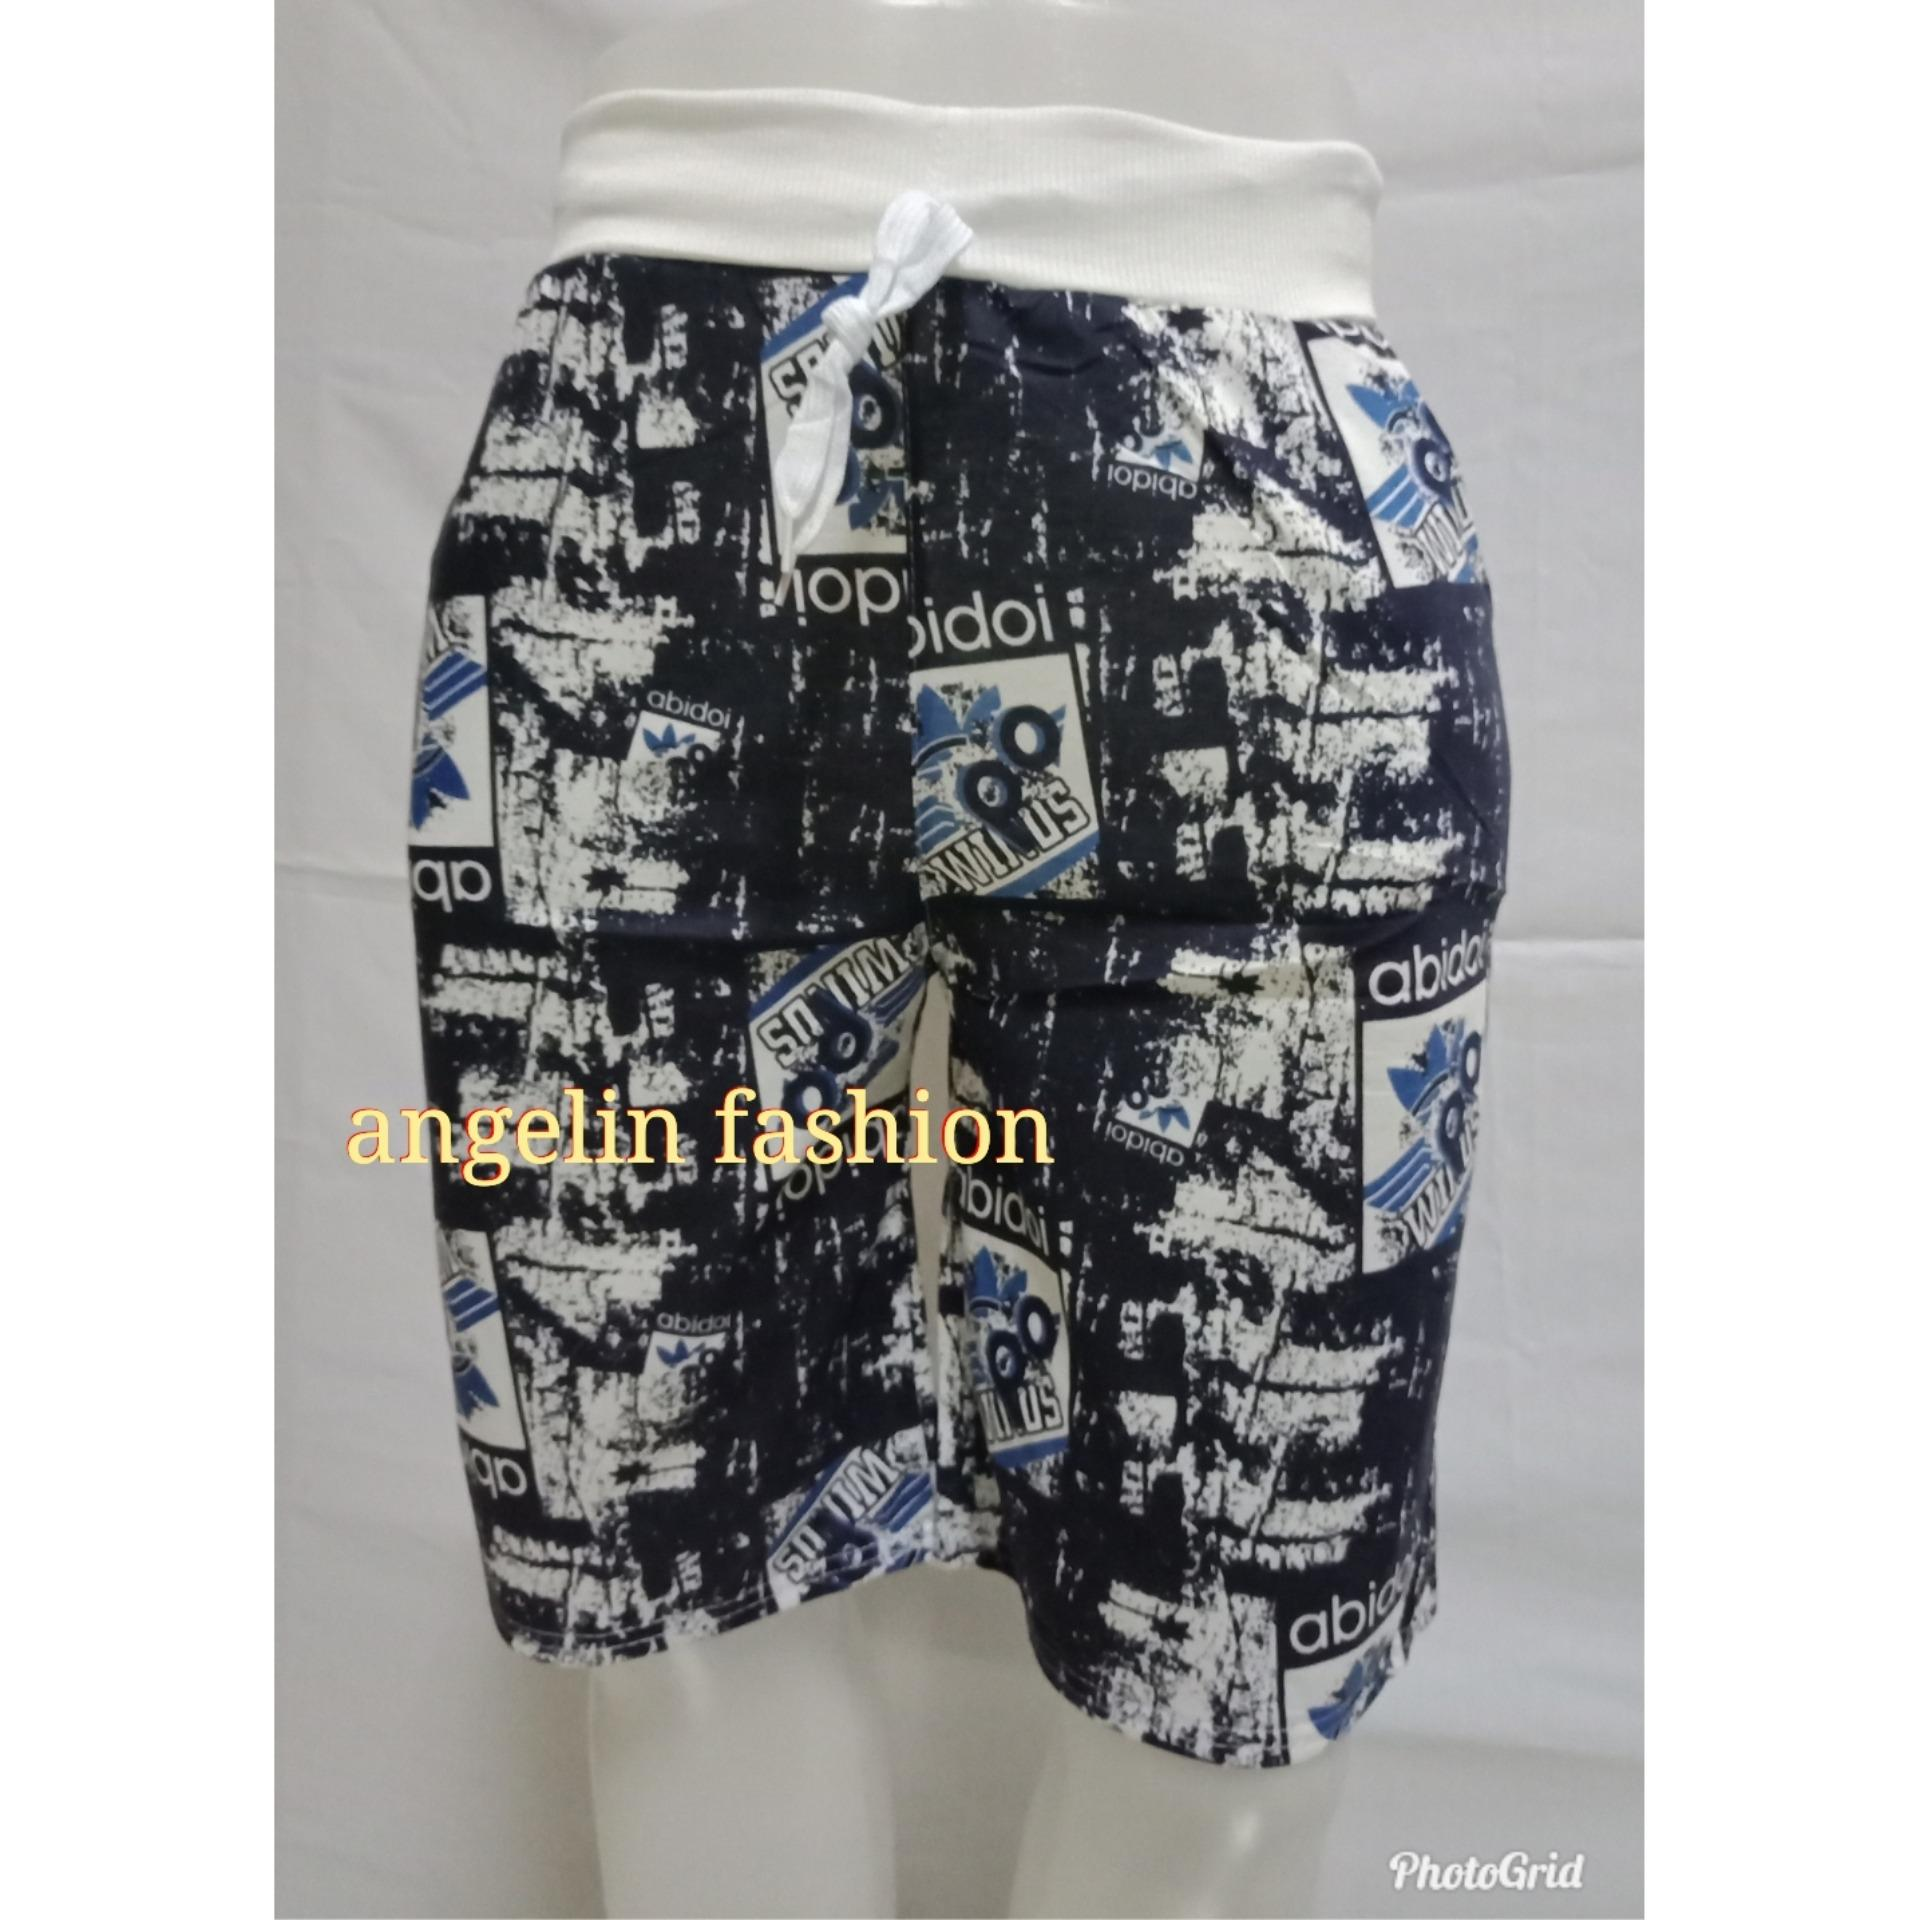 angelin_fashion/celana pendek pria/celana pendek santai pria/celana pendek gaul pria